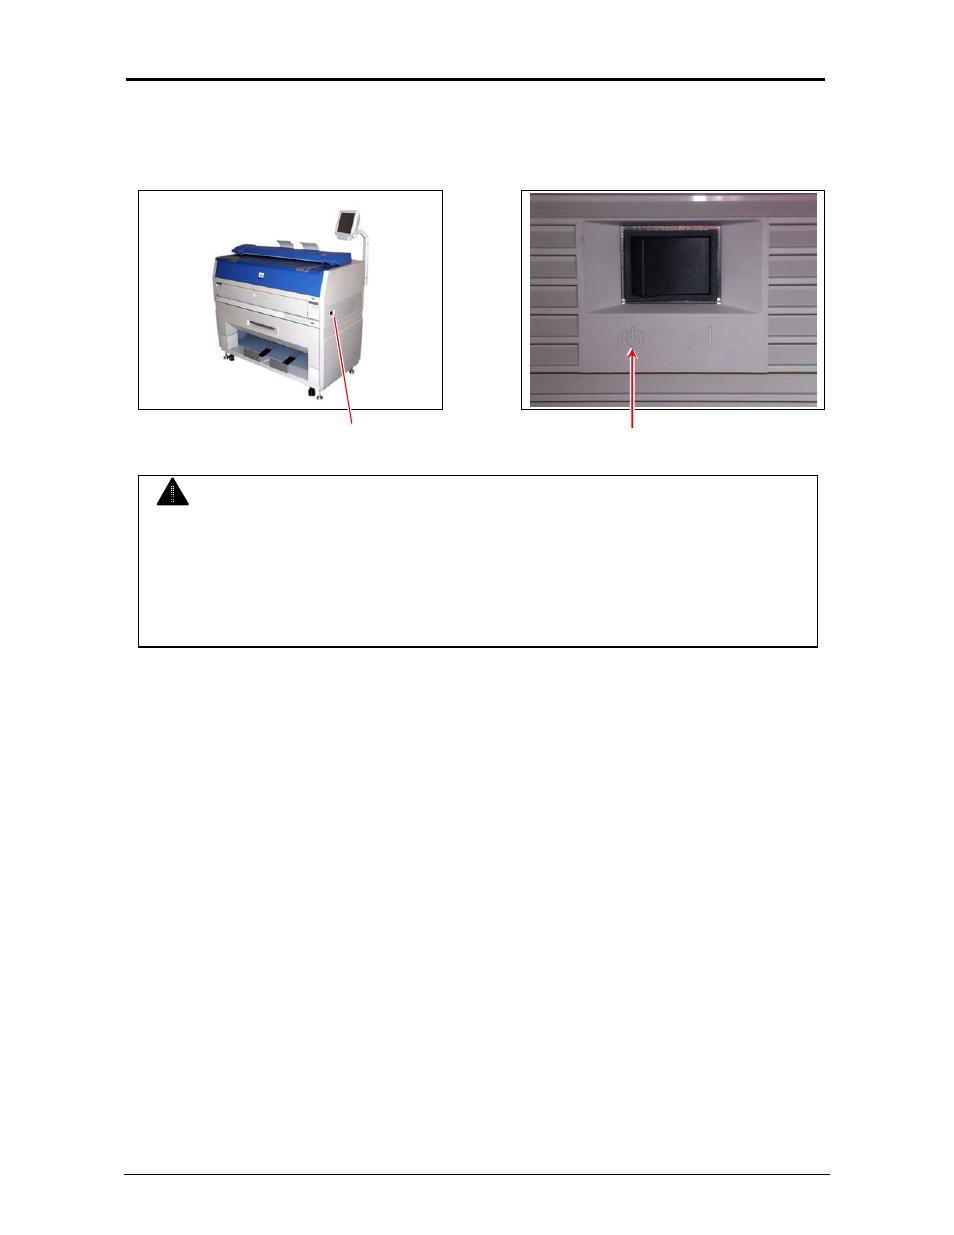 caution konica minolta kip 3100 user manual page 24 56 rh manualsdir com